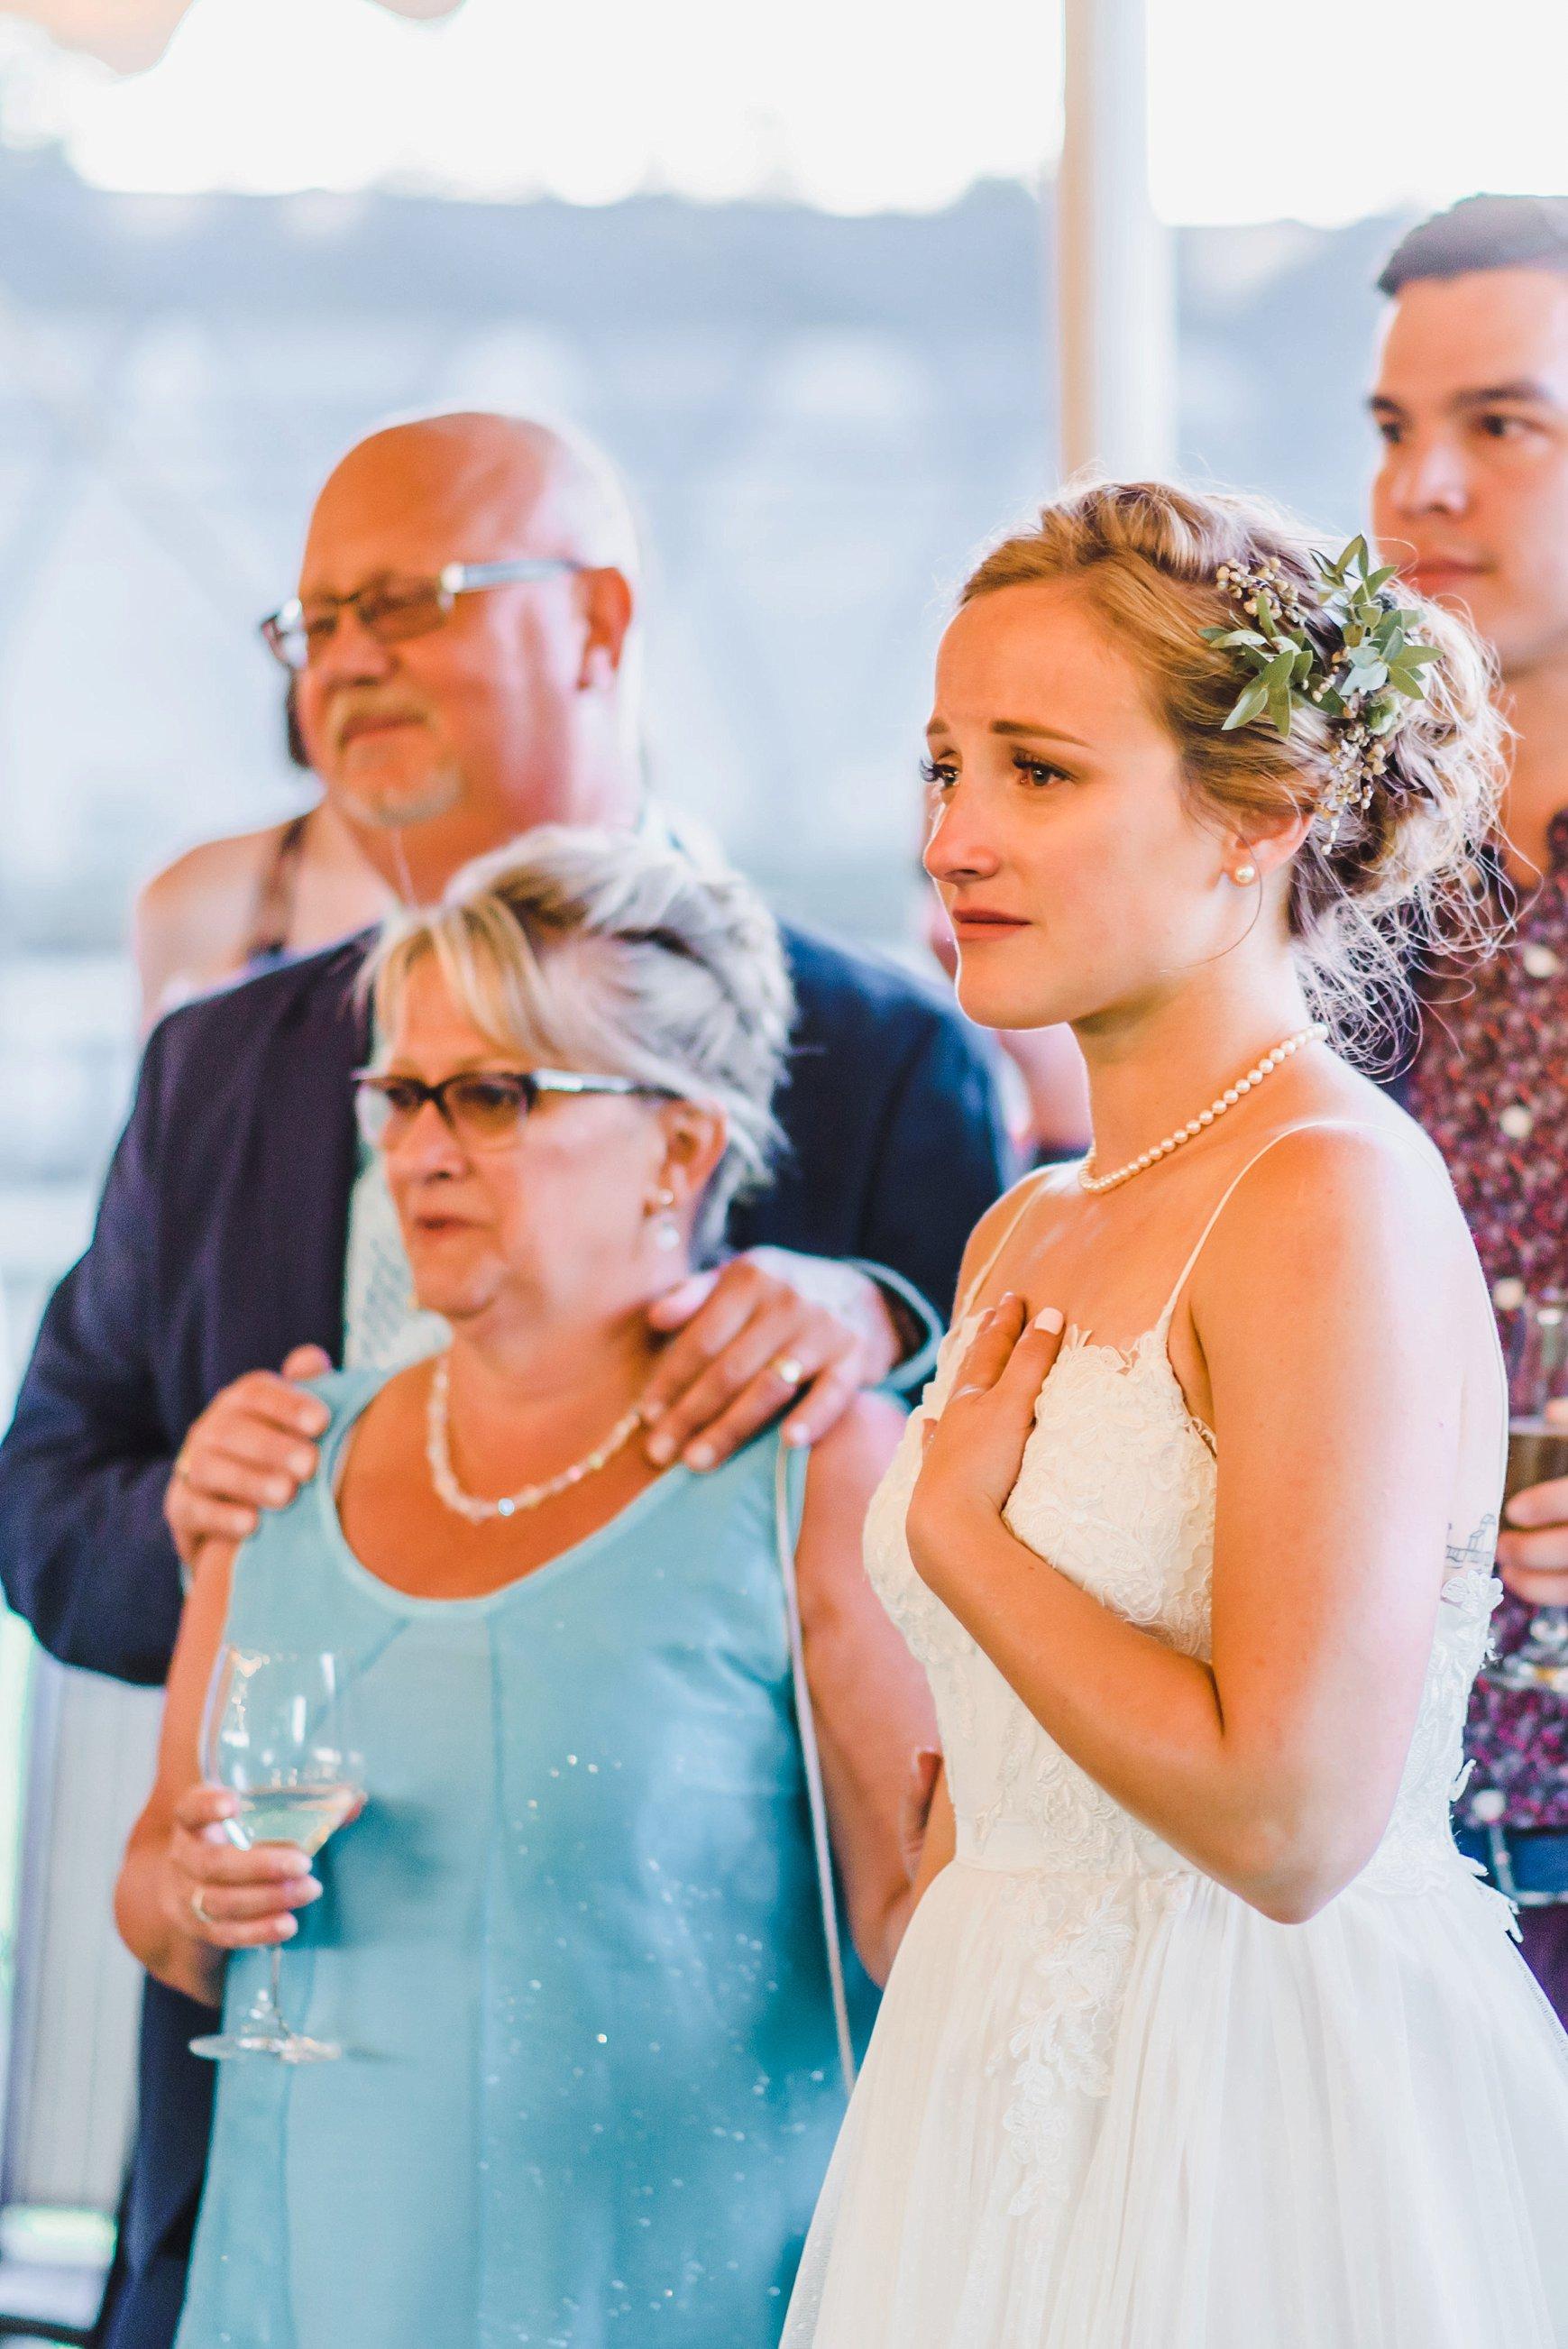 light airy indie fine art ottawa wedding photographer | Ali and Batoul Photography_0914.jpg